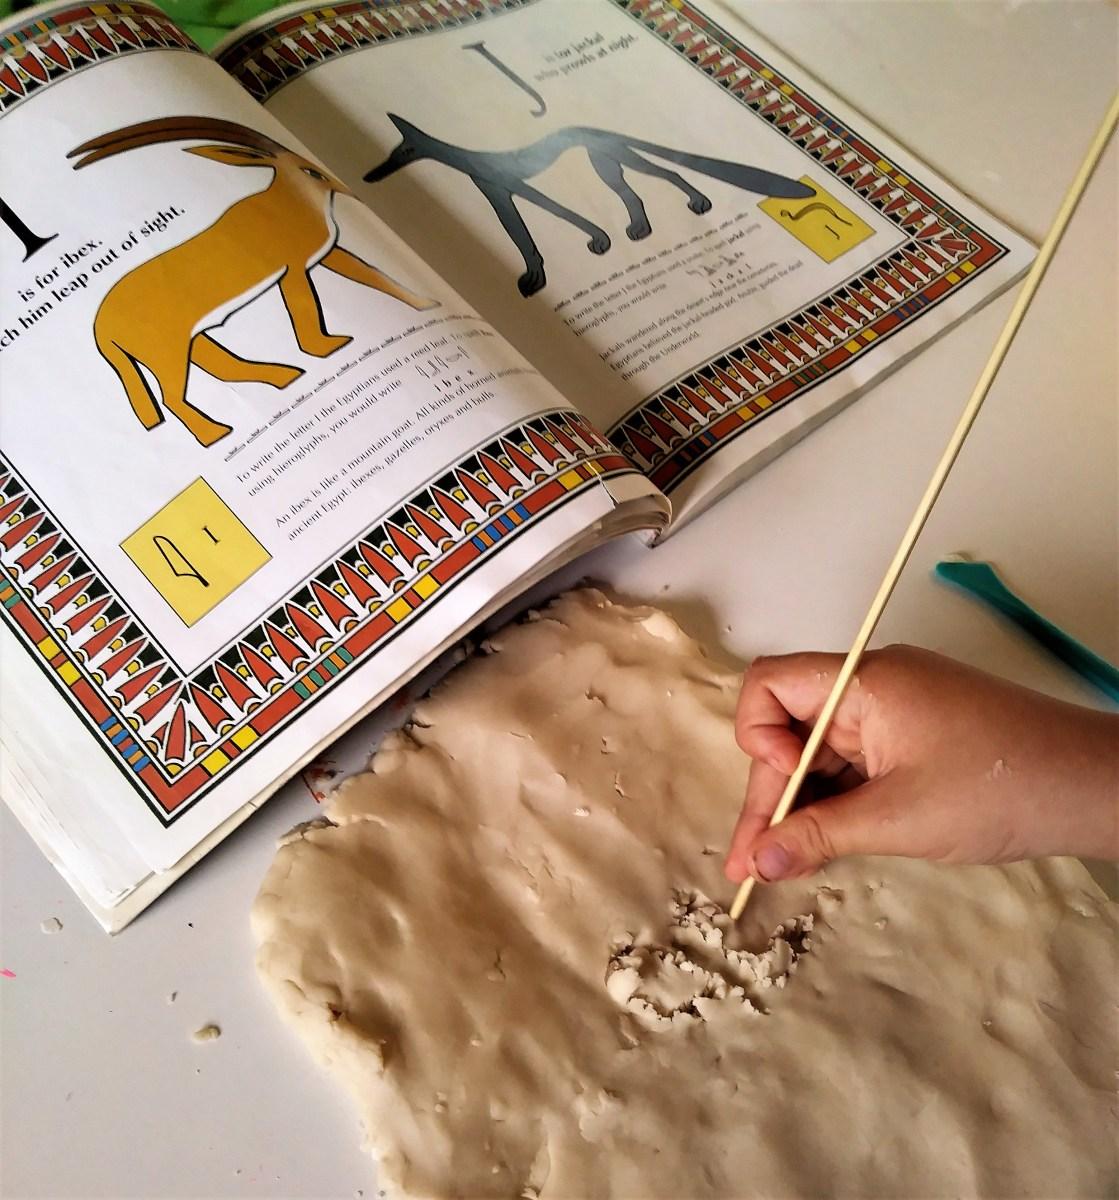 Carve hieroglyphics